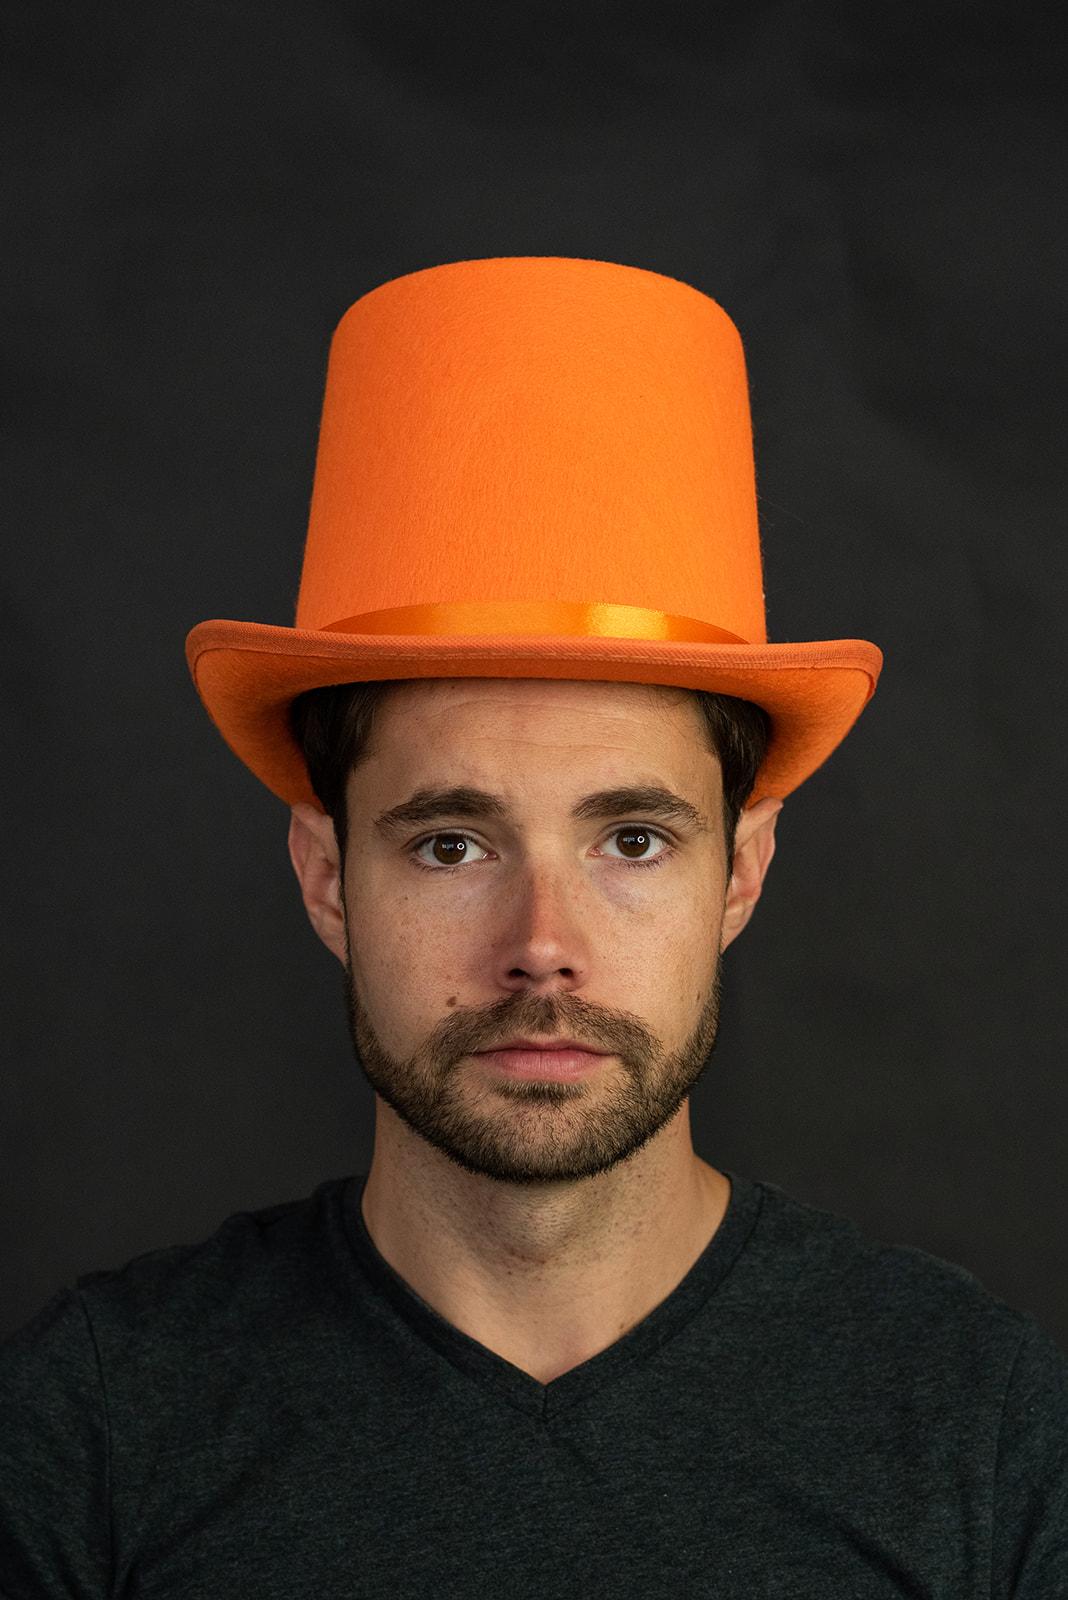 thumbnail 6 - Dumb and Dumber Orange Tall  Felt Top Hat Lloyd Christmas Costume Accessory